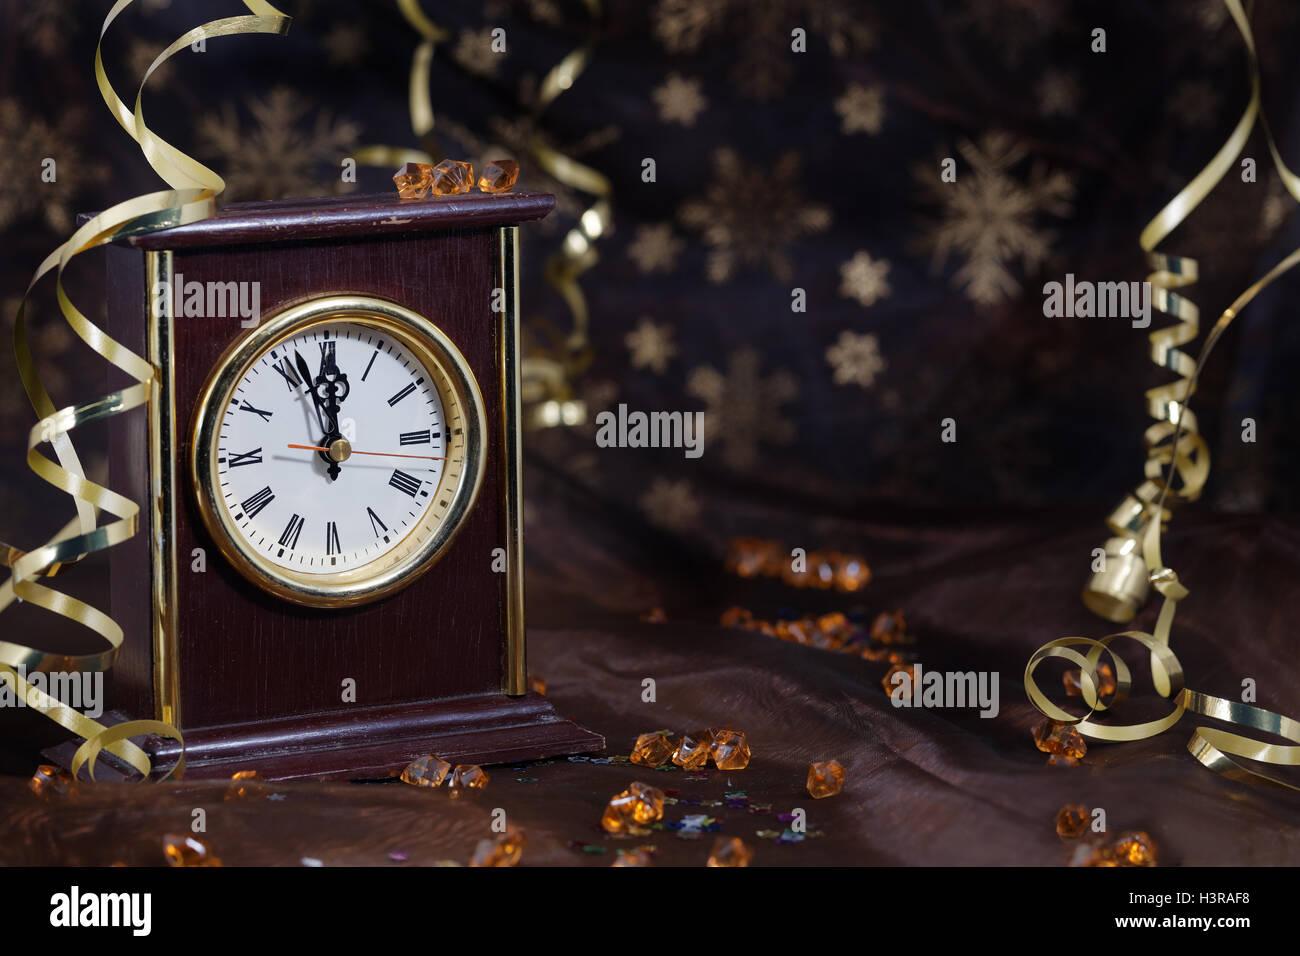 Happy New Year 2017 - Stock Image